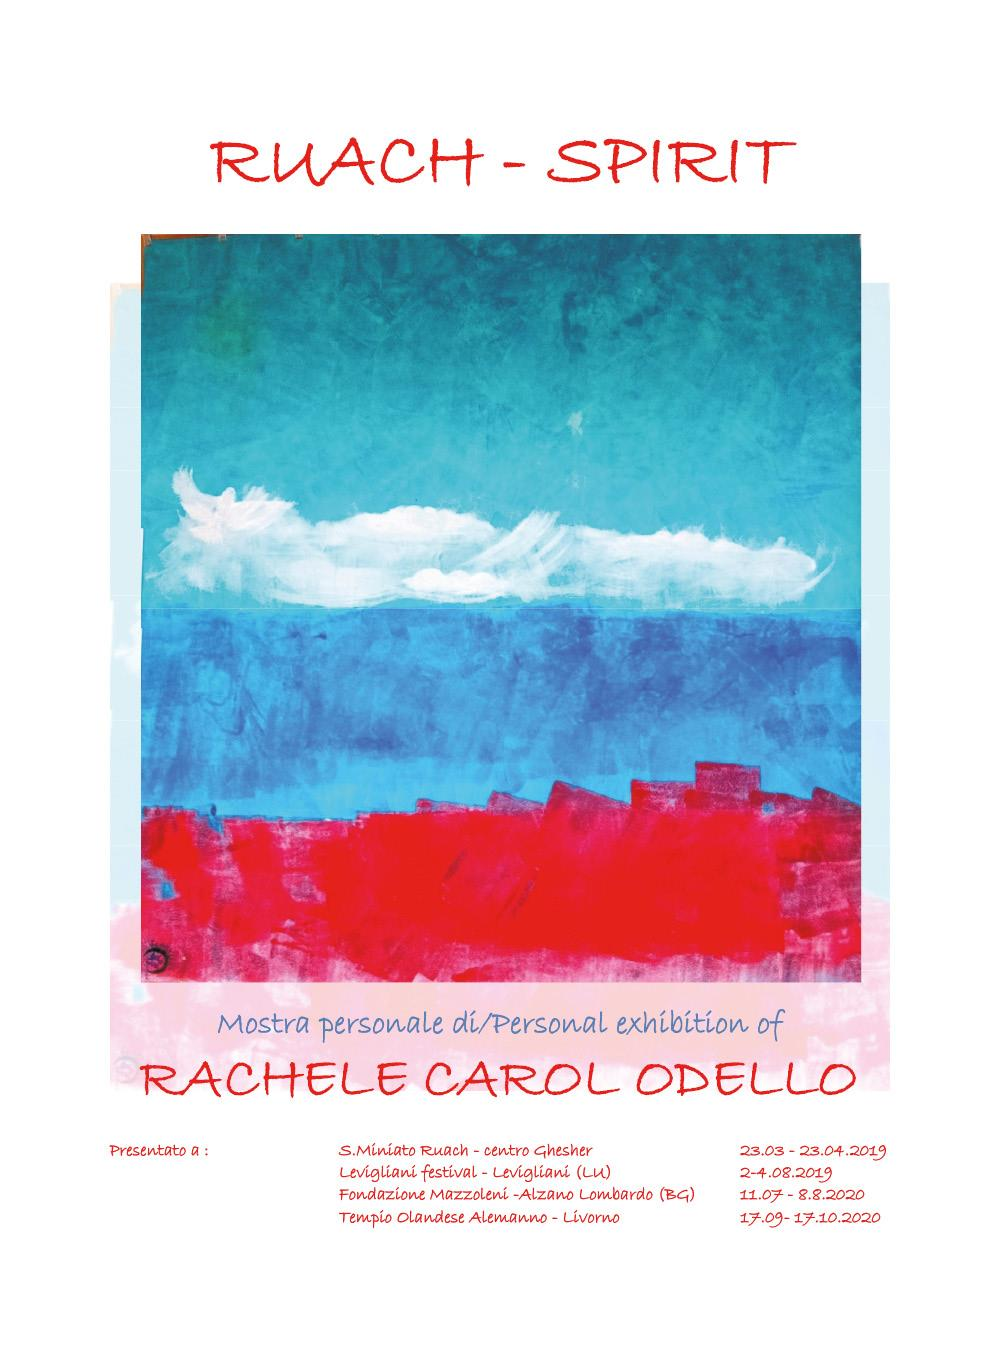 Ruach - Spirit - Personal art exhibition - Artist Rachele Carol Odello